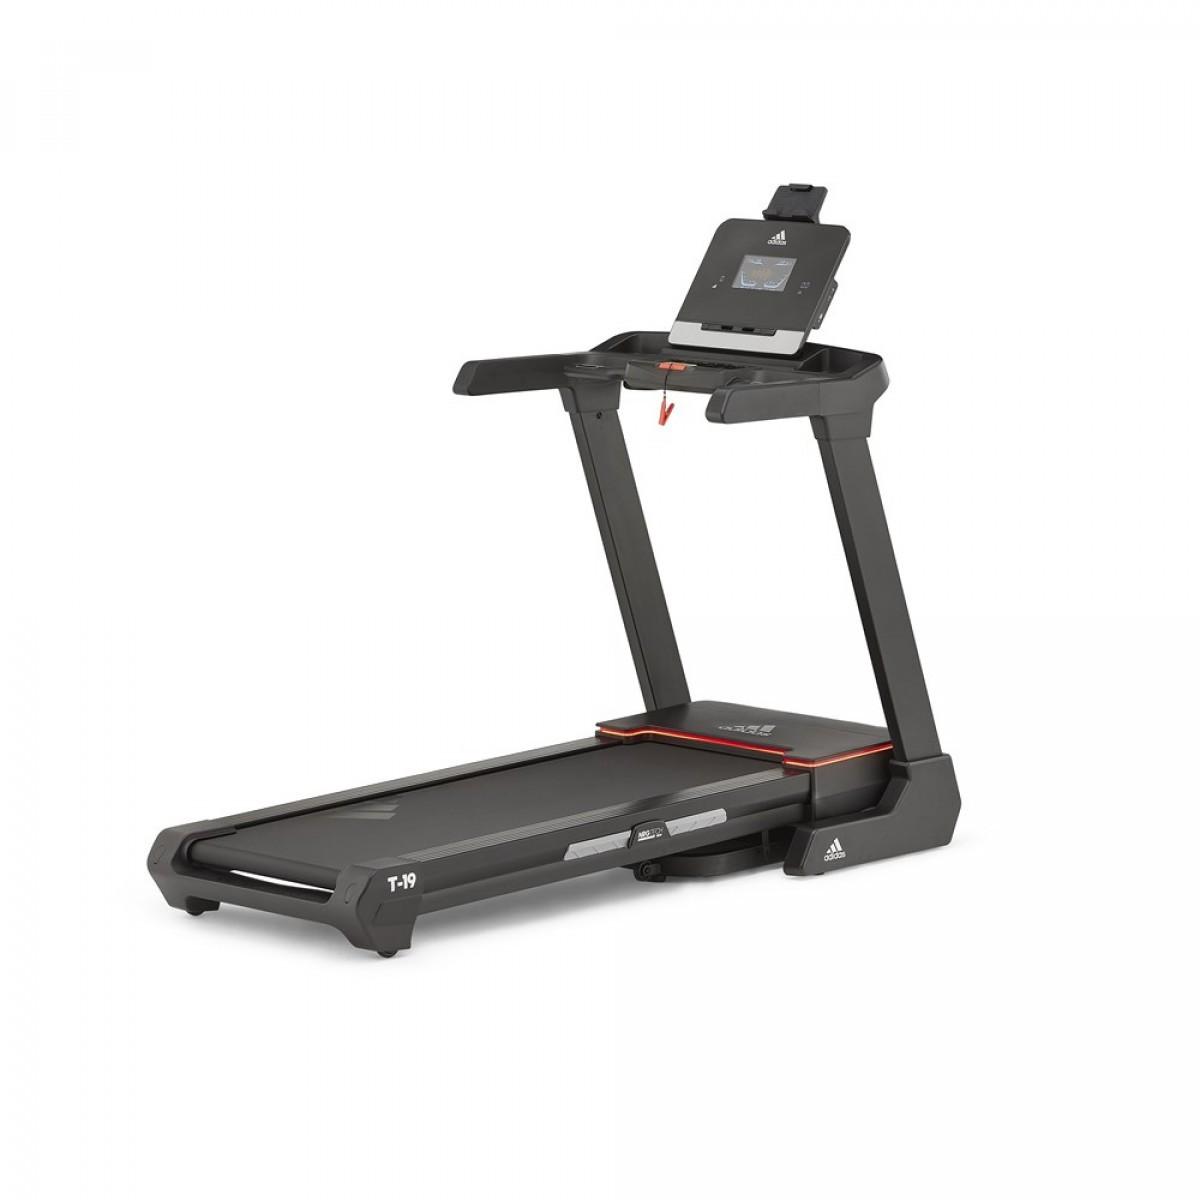 Adidas Löpband Treadmill T19